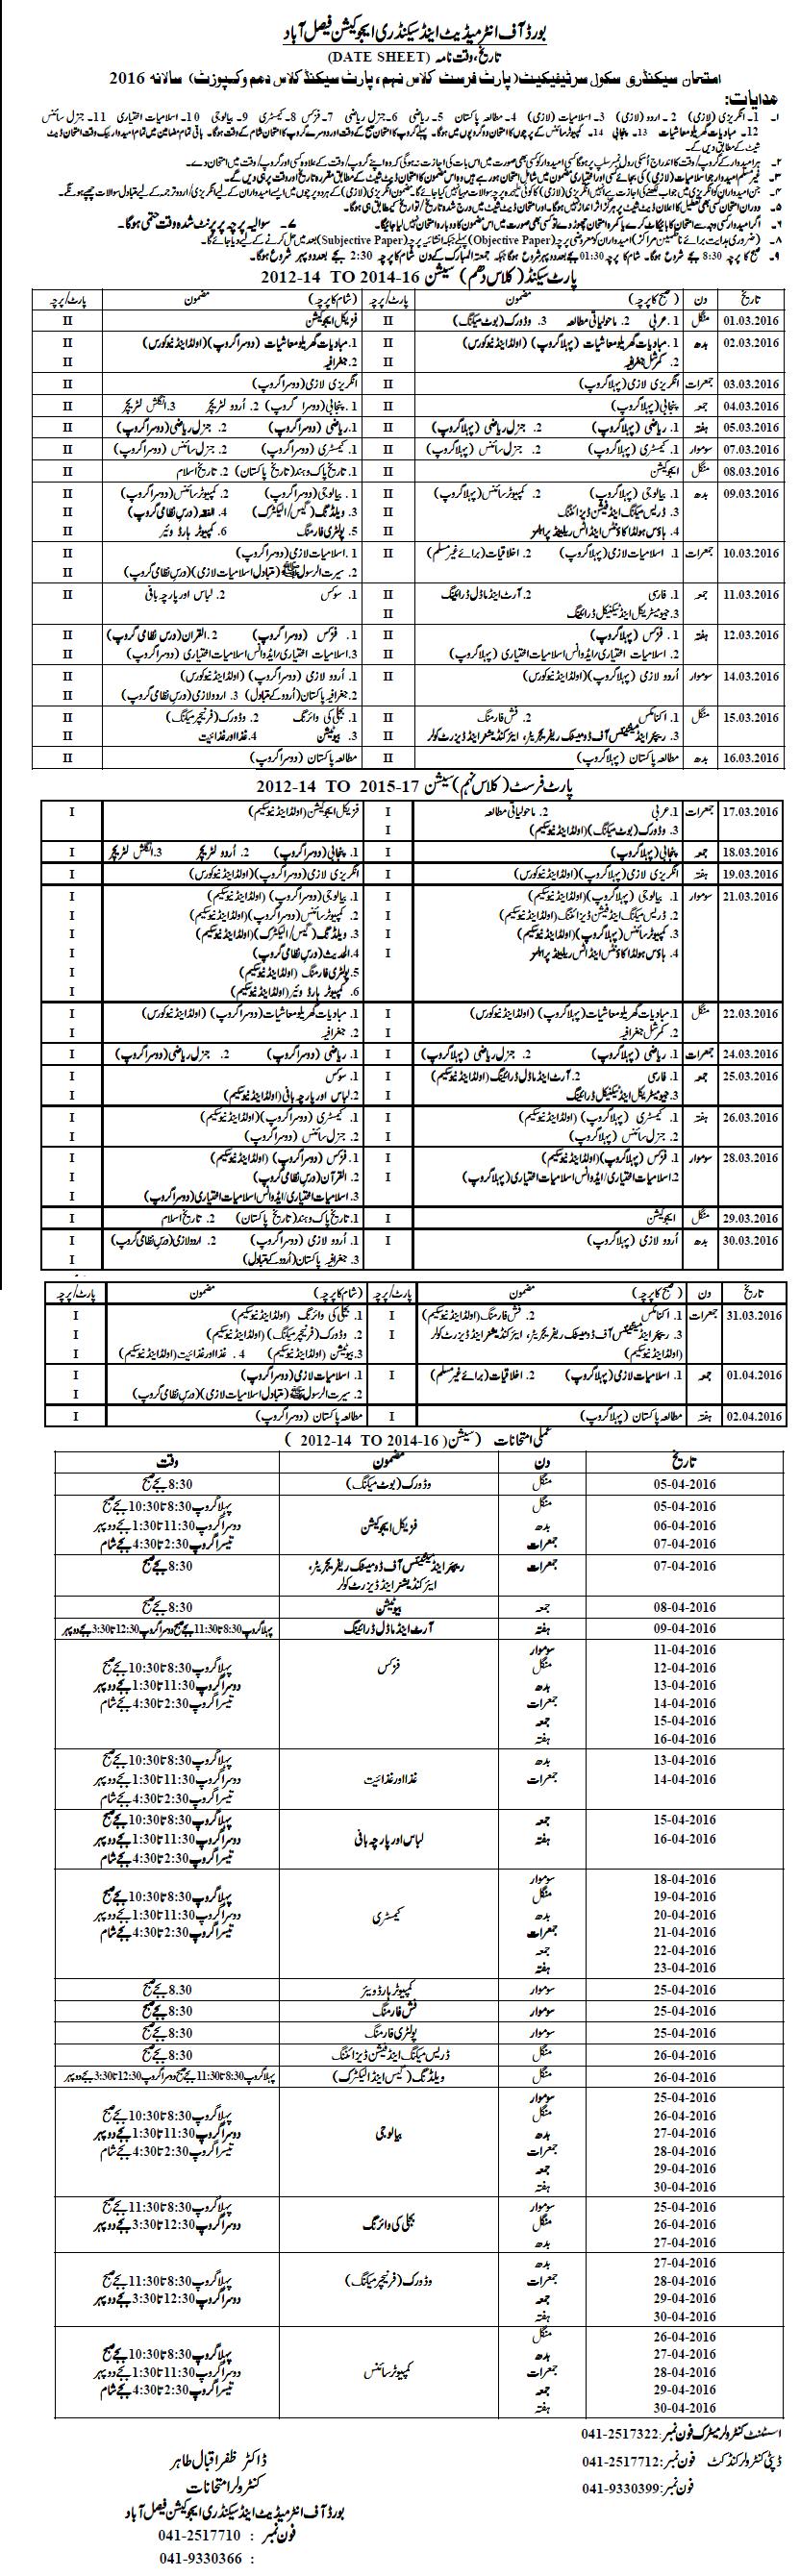 BISE Faisalabad Board Matric 10th Class Date Sheet 2016